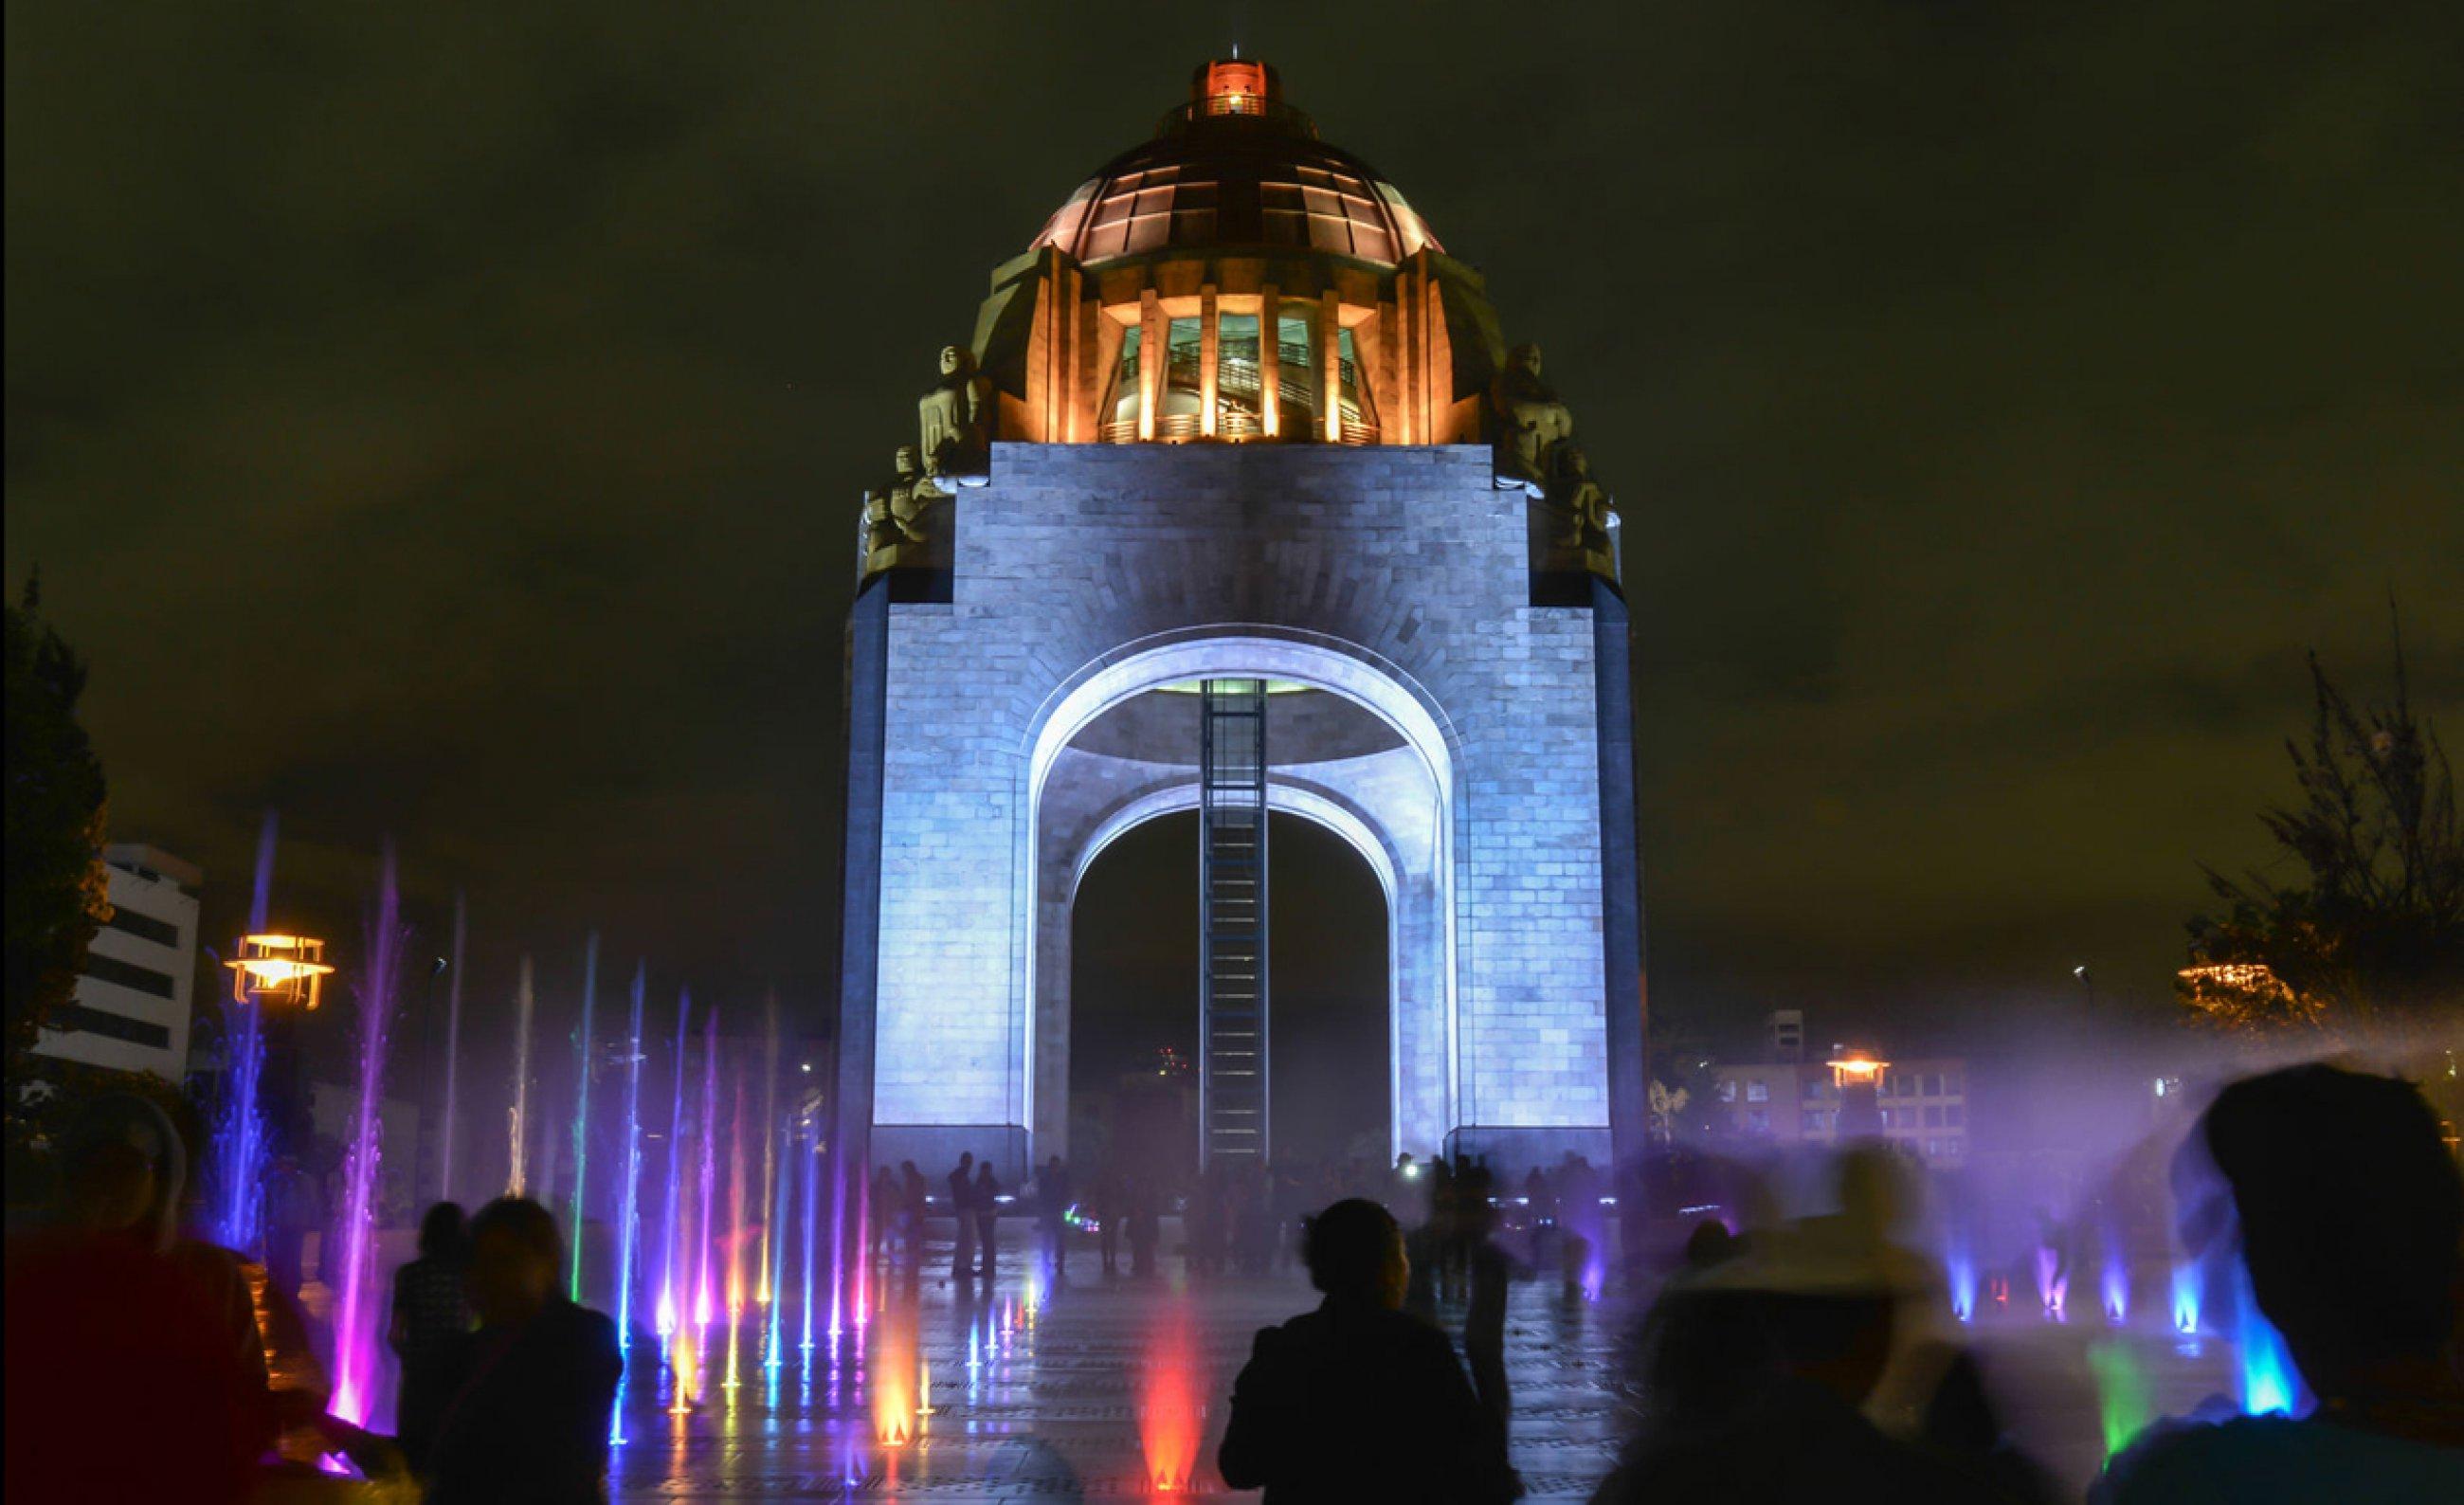 https://bubo.sk/uploads/galleries/5010/ciudad-mexico.jpg